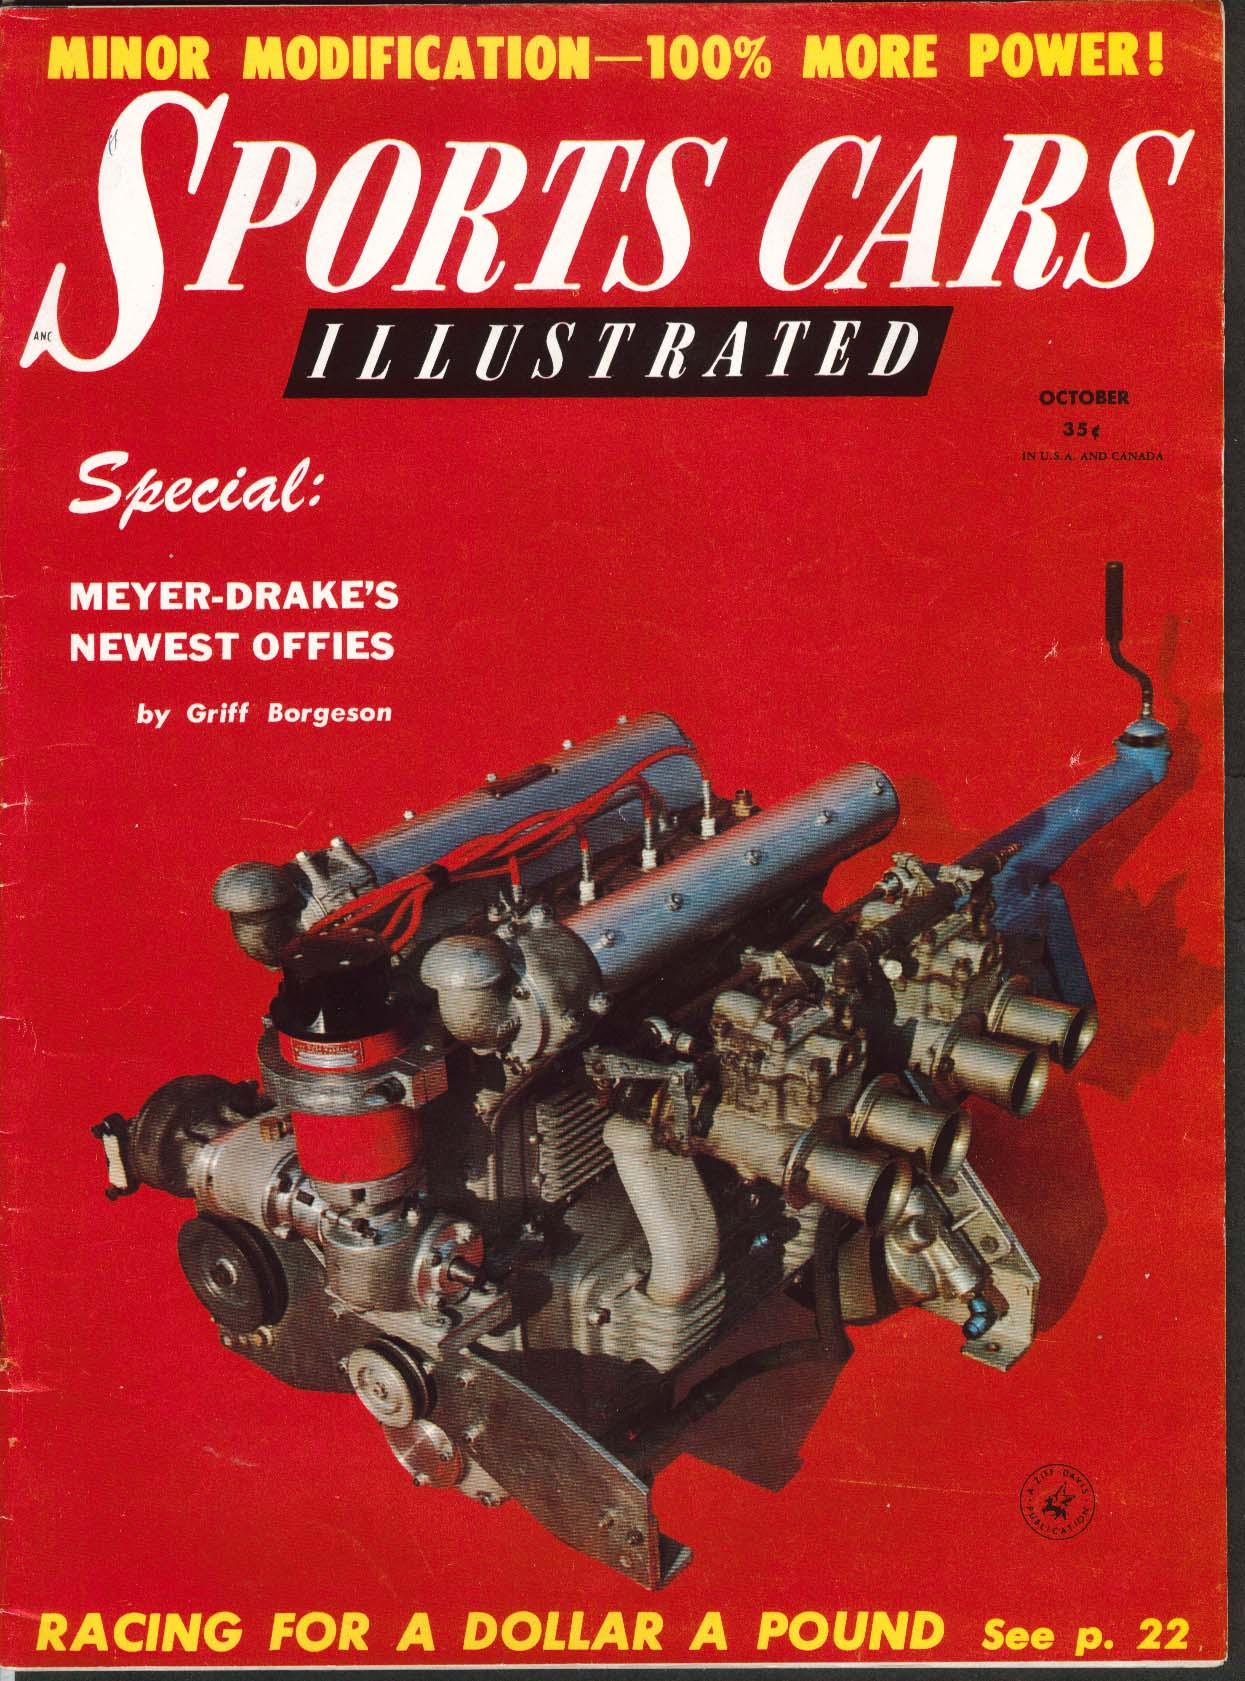 Image for SPORTS CARS ILLUSTRATED Renault Dauphine 2.4 Jaguar road tests 10 1956